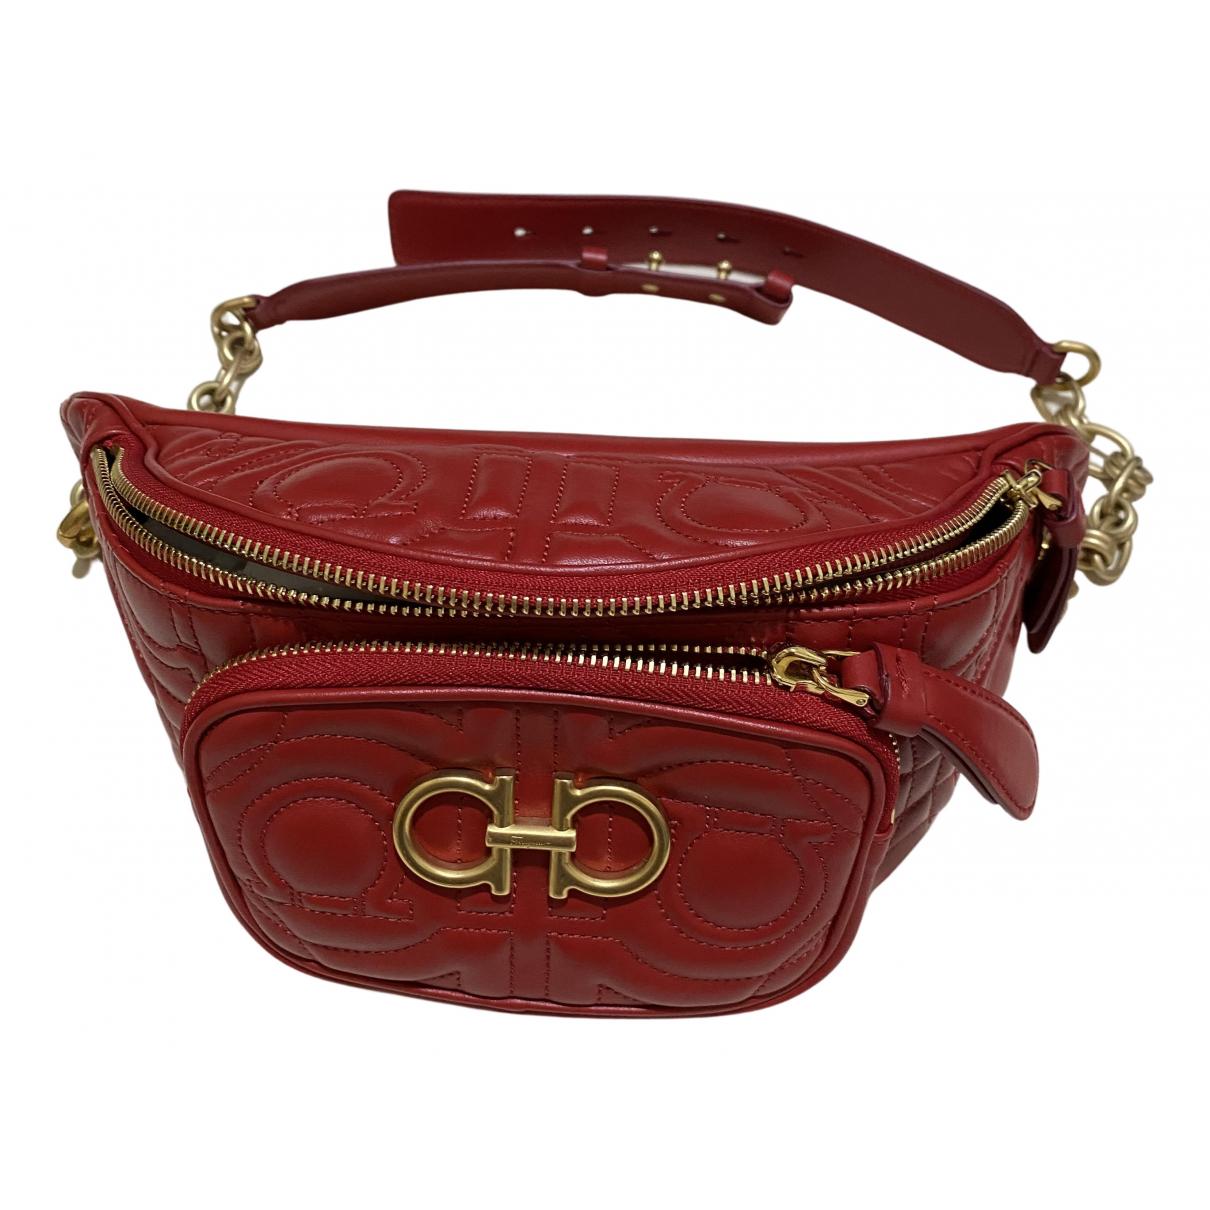 Salvatore Ferragamo \N Red Leather handbag for Women \N